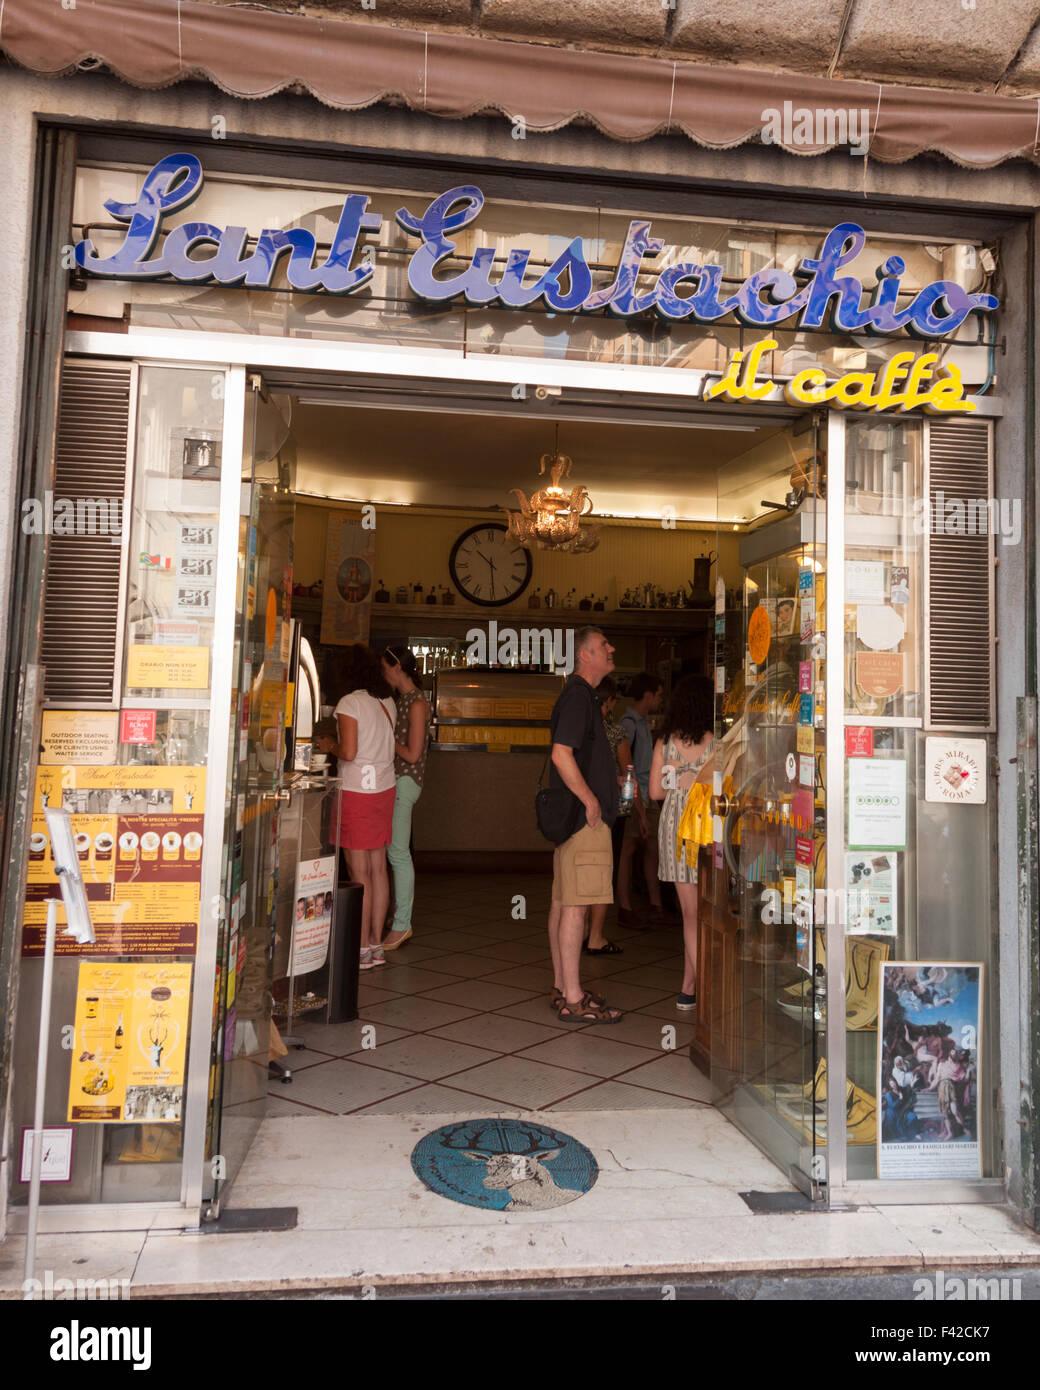 Sant'Eustacchio Il Caffe, Rome - Stock Image